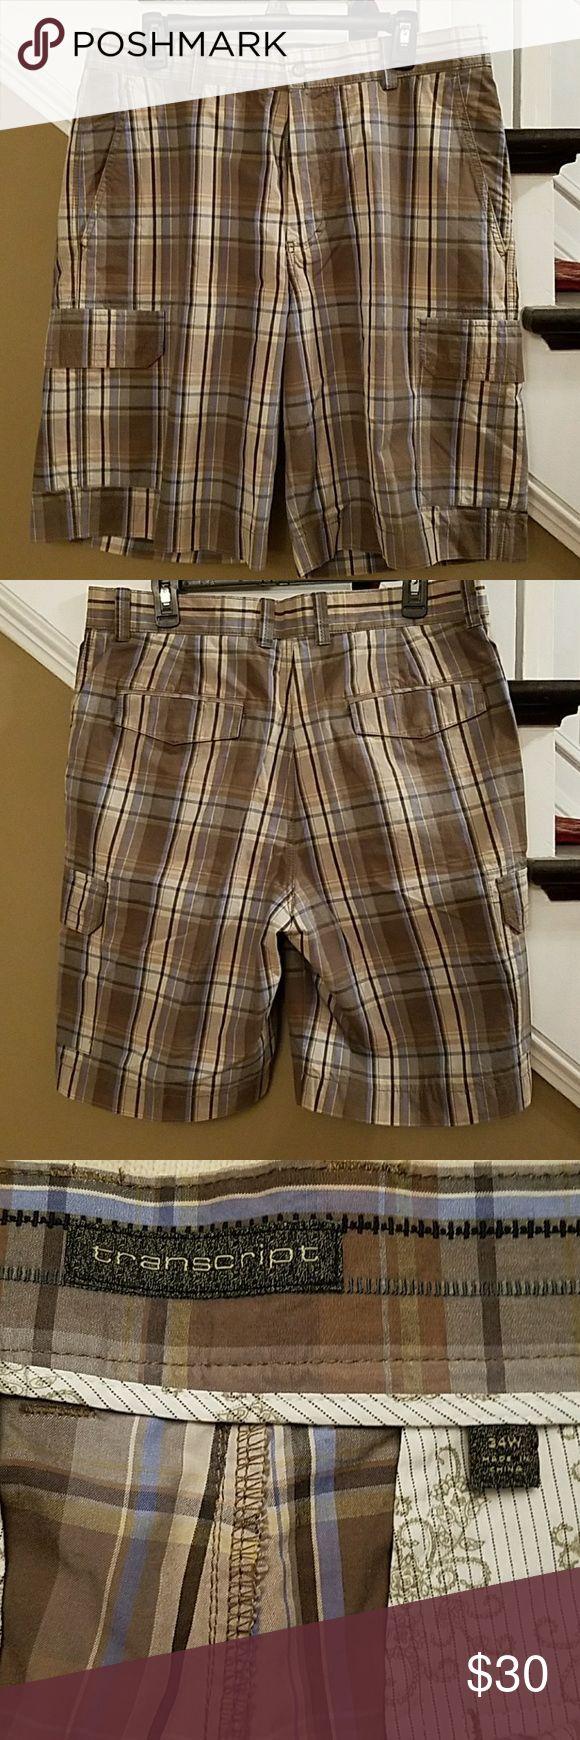 Transcript Bermuda Shorts mens Size 34, 100% cotton euc Transcript Shorts